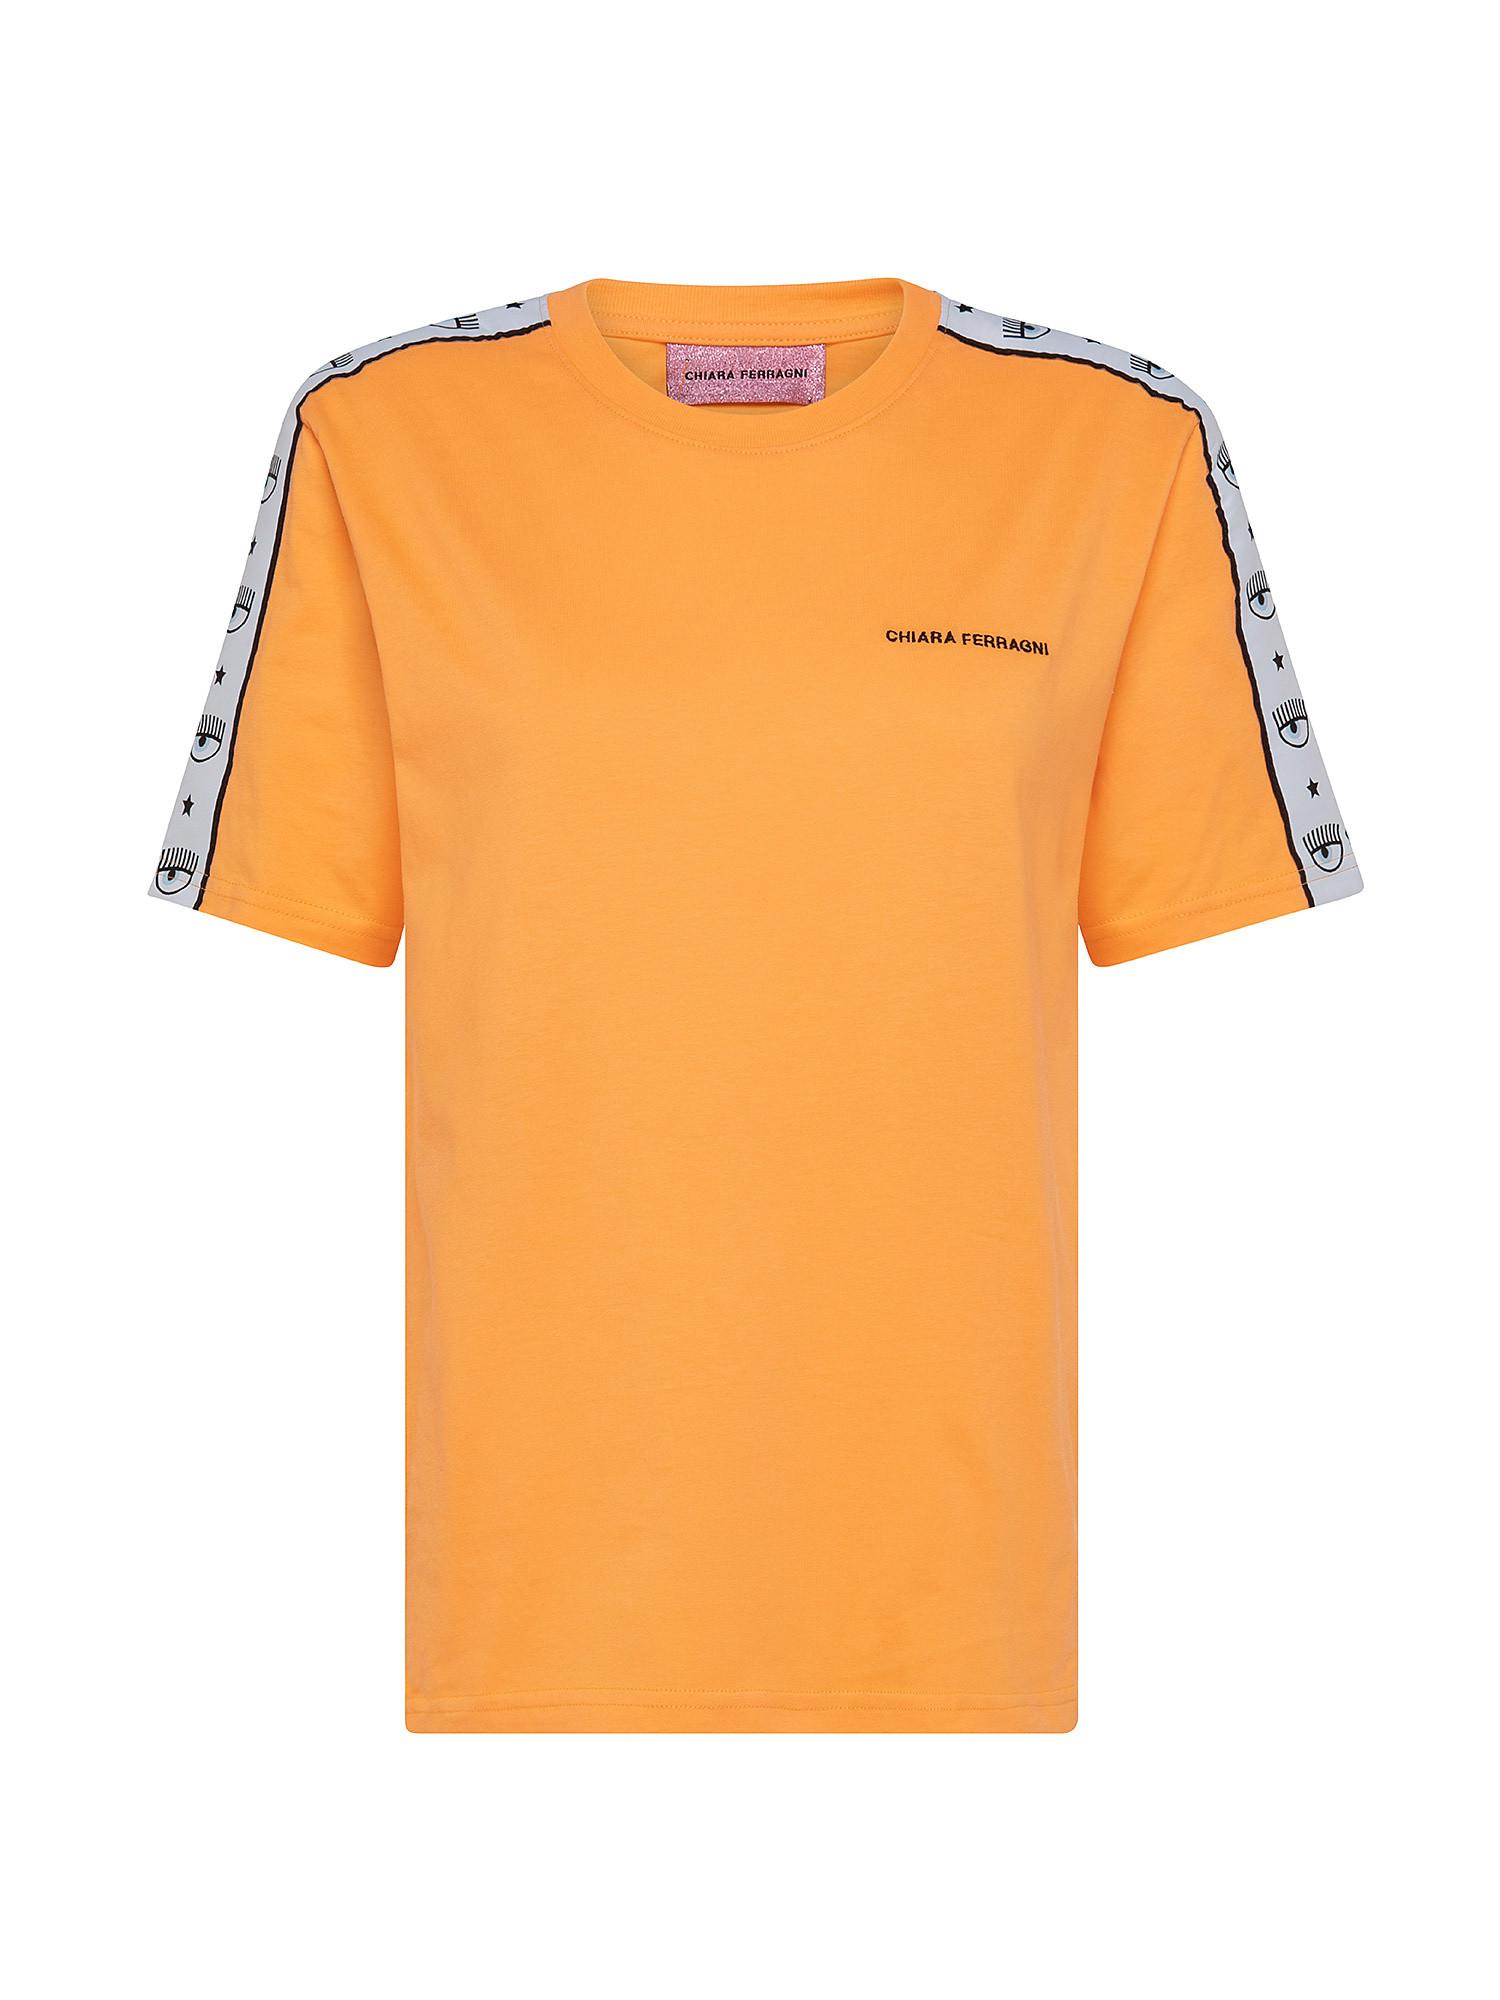 Logomania T-Shirt over, Arancione, large image number 0